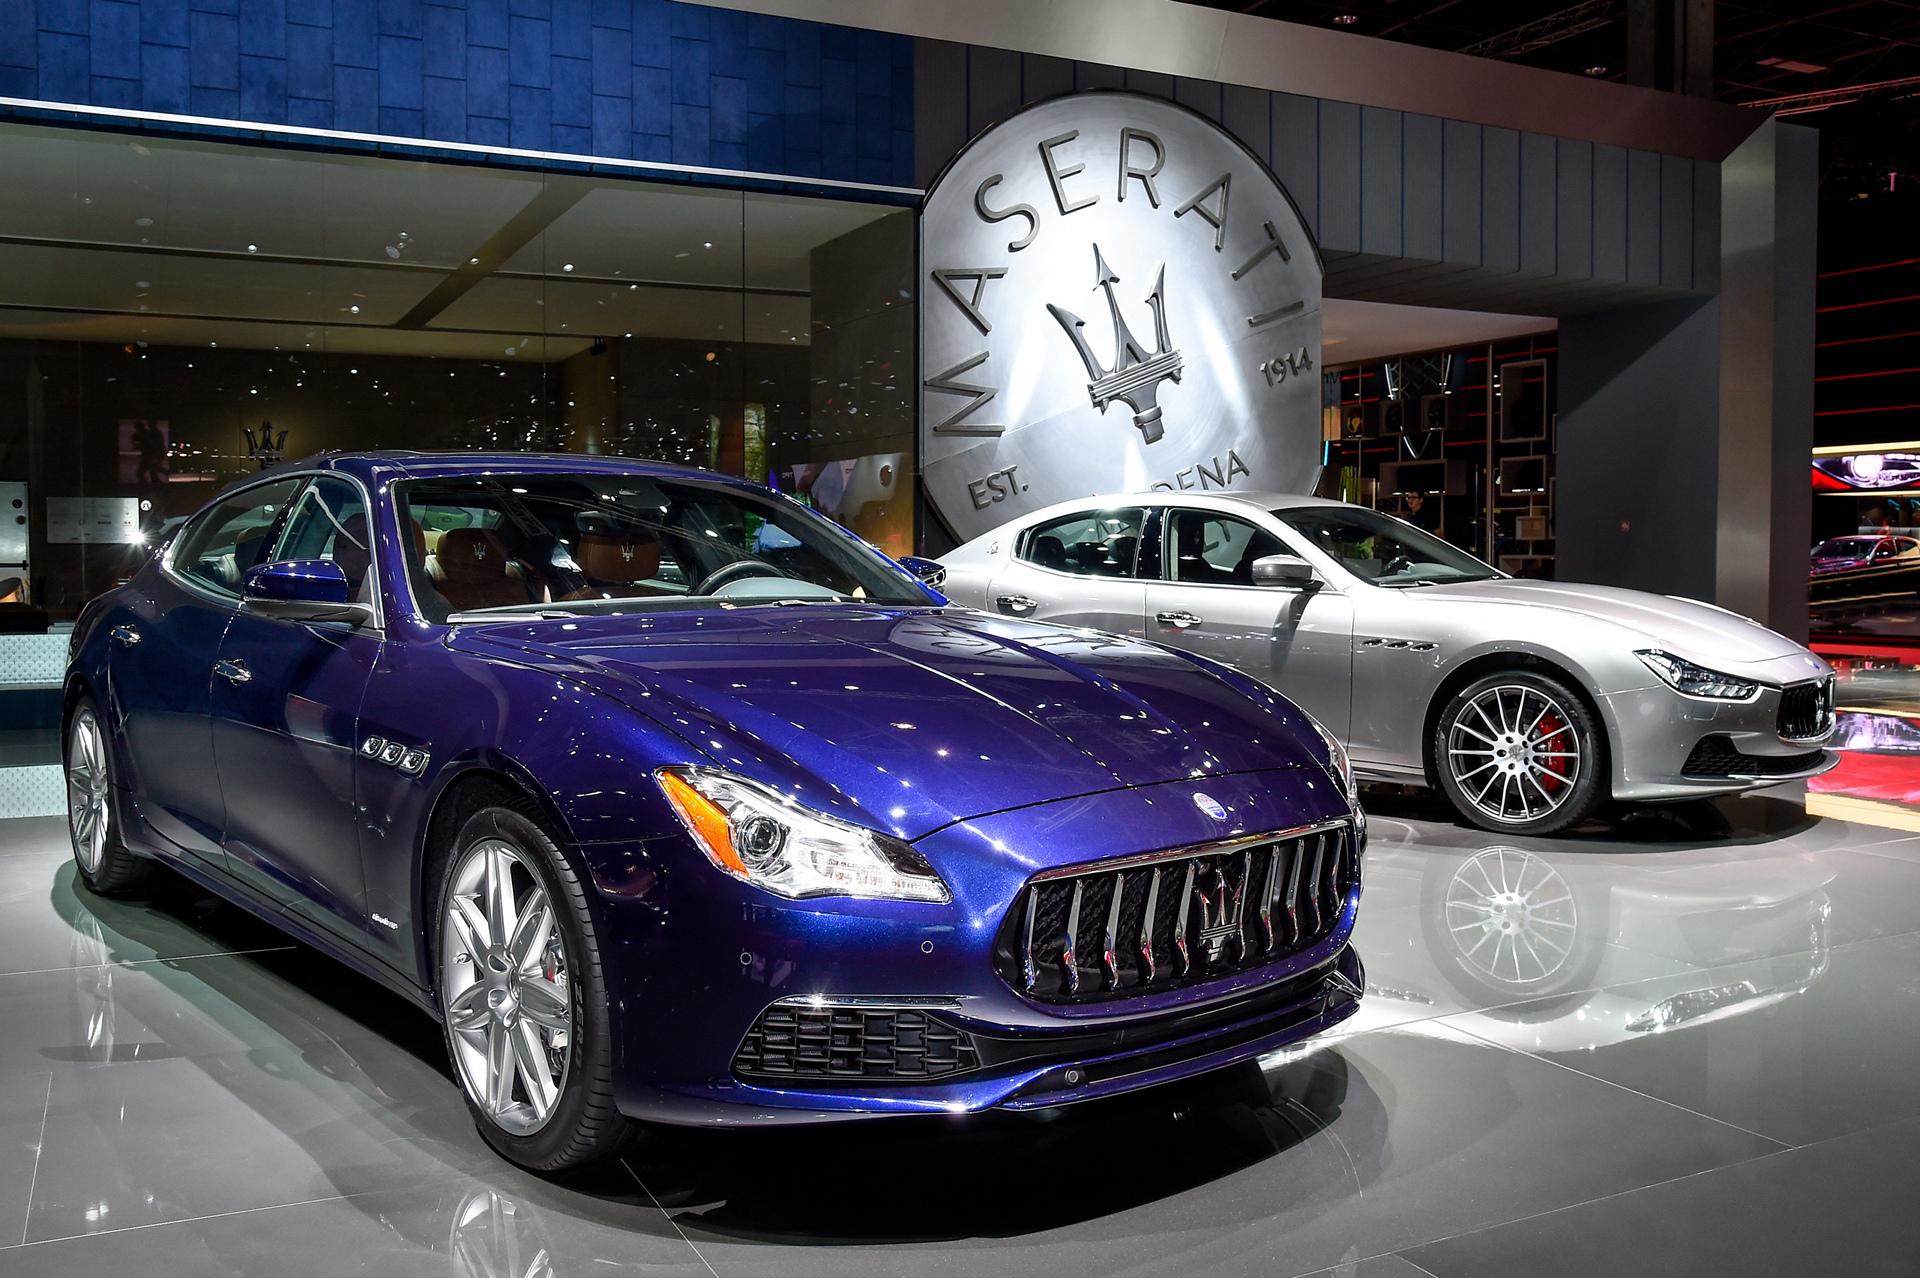 Maserati Quattroporte GranLusso © Fiat Chrysler Automobiles N.V.